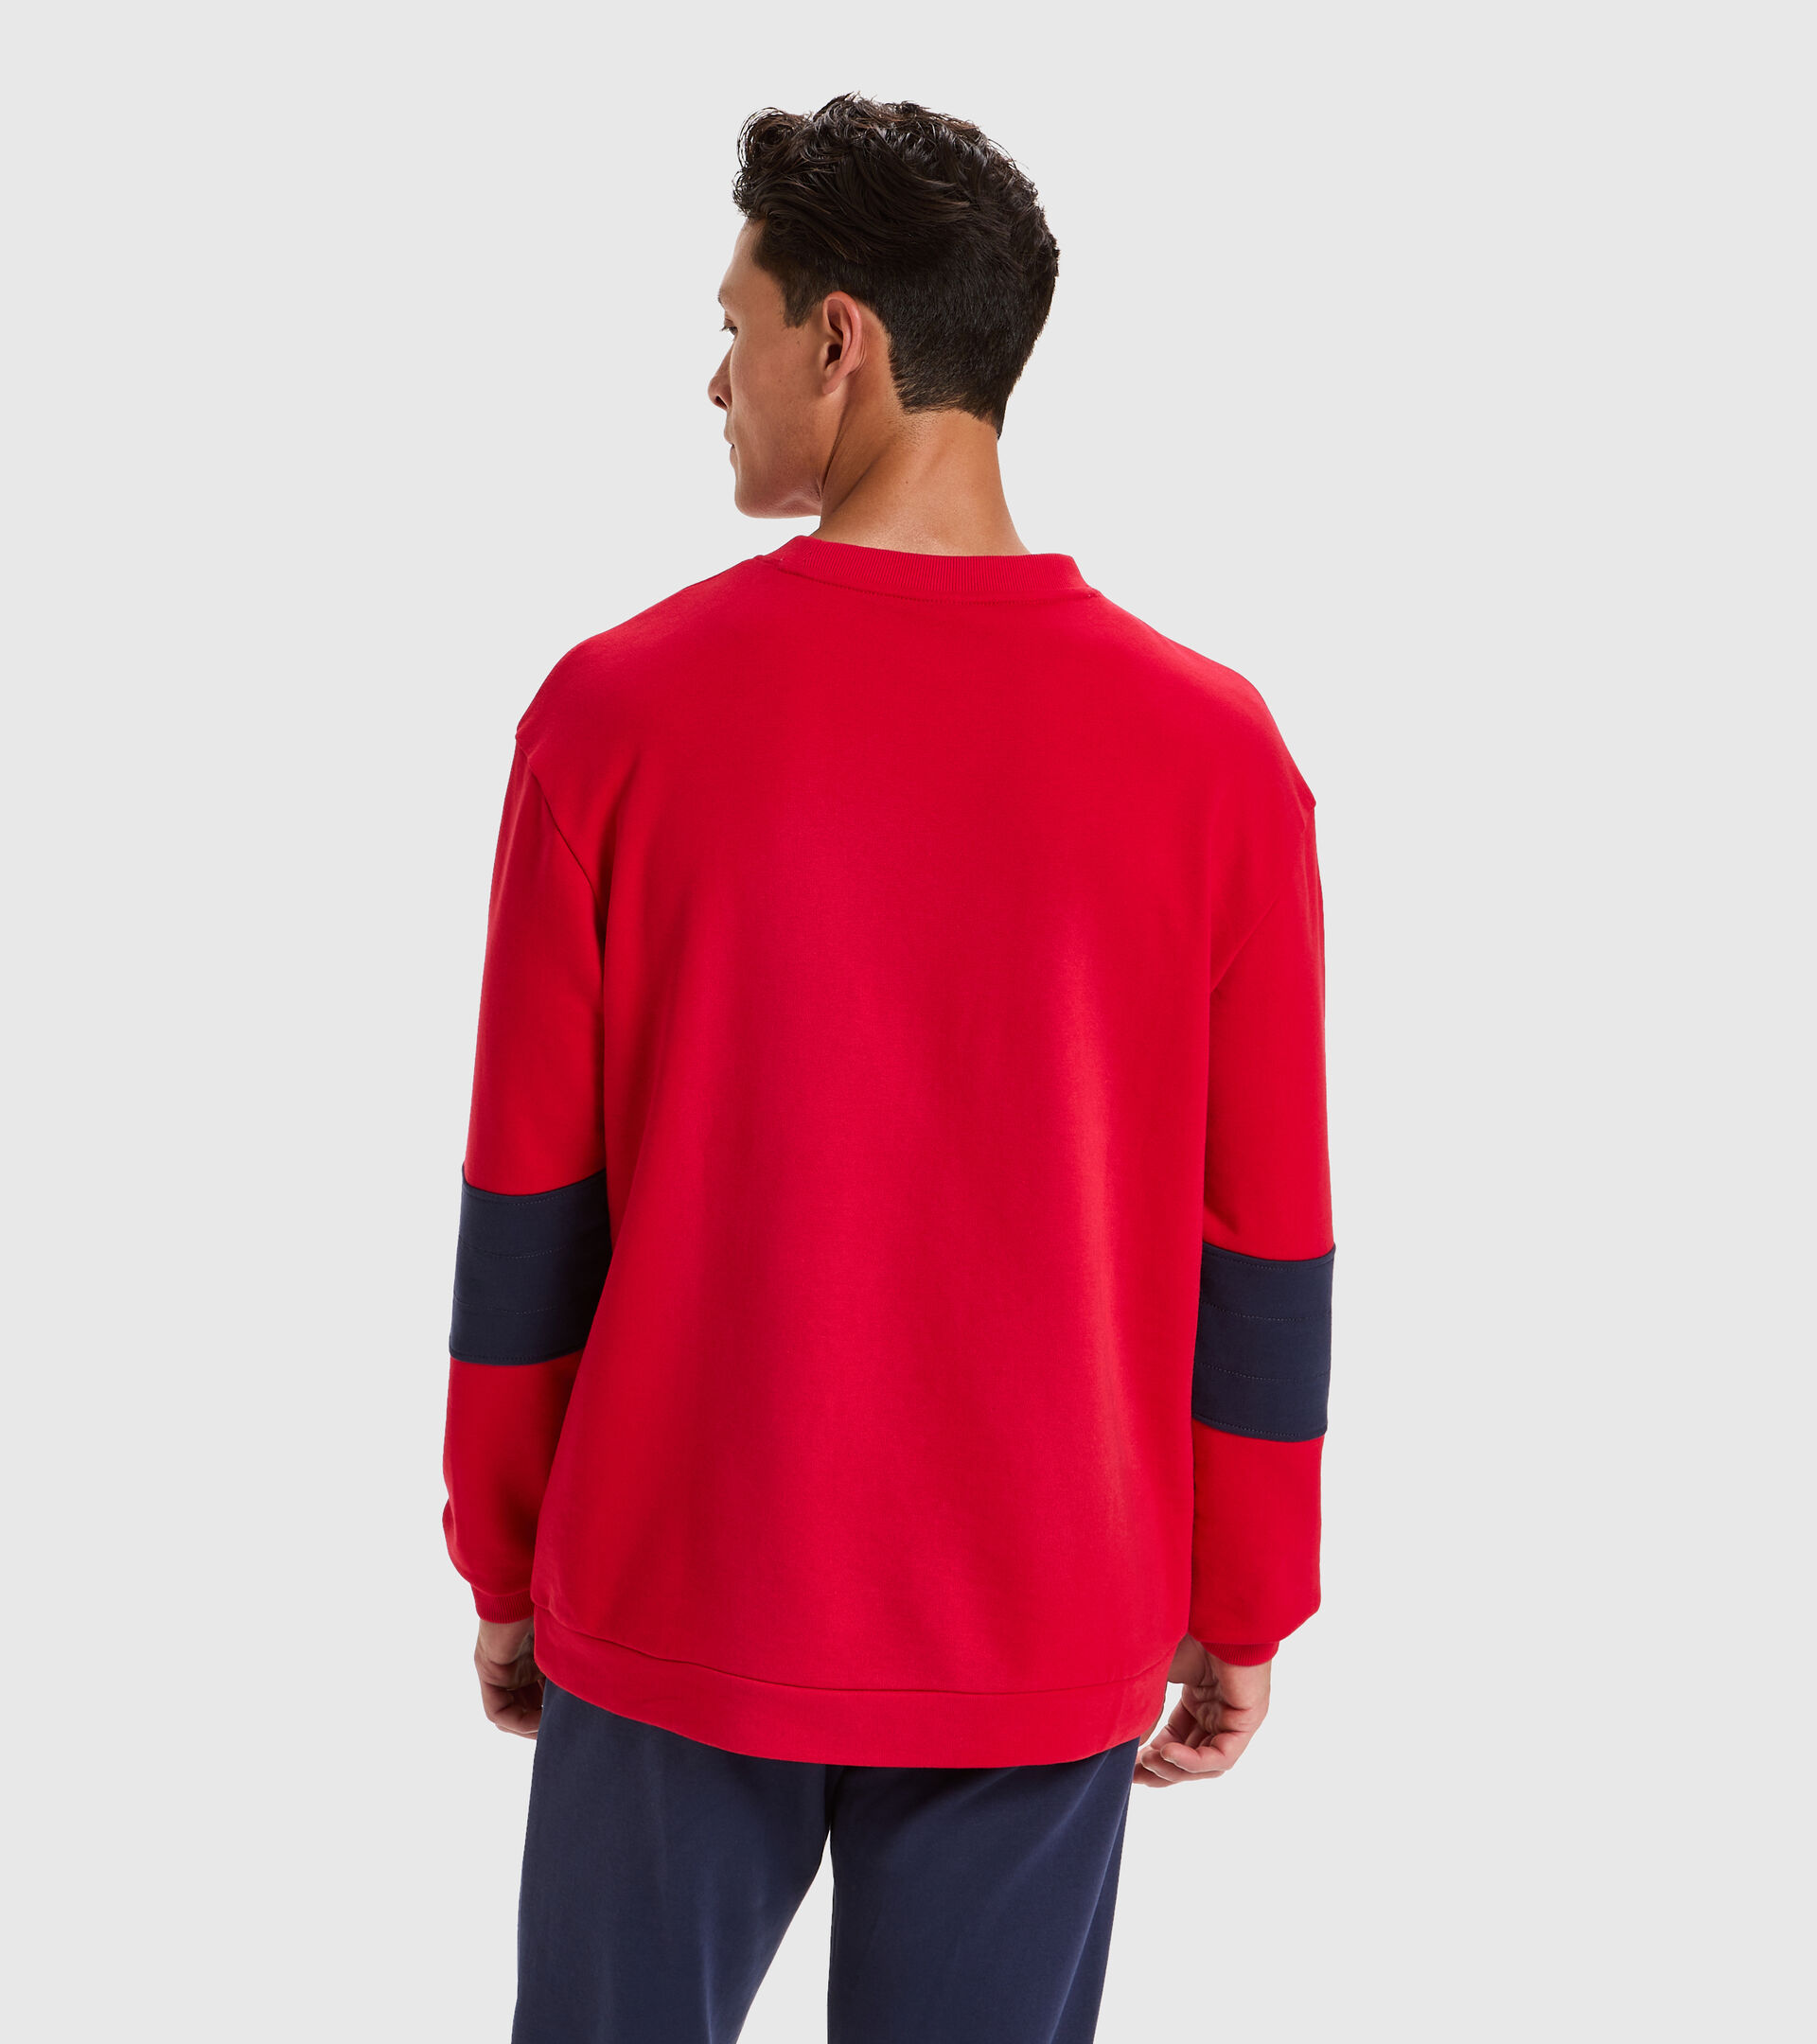 Apparel Sport UOMO SWEATSHIRT CREW SHIELD TANGO RED Diadora